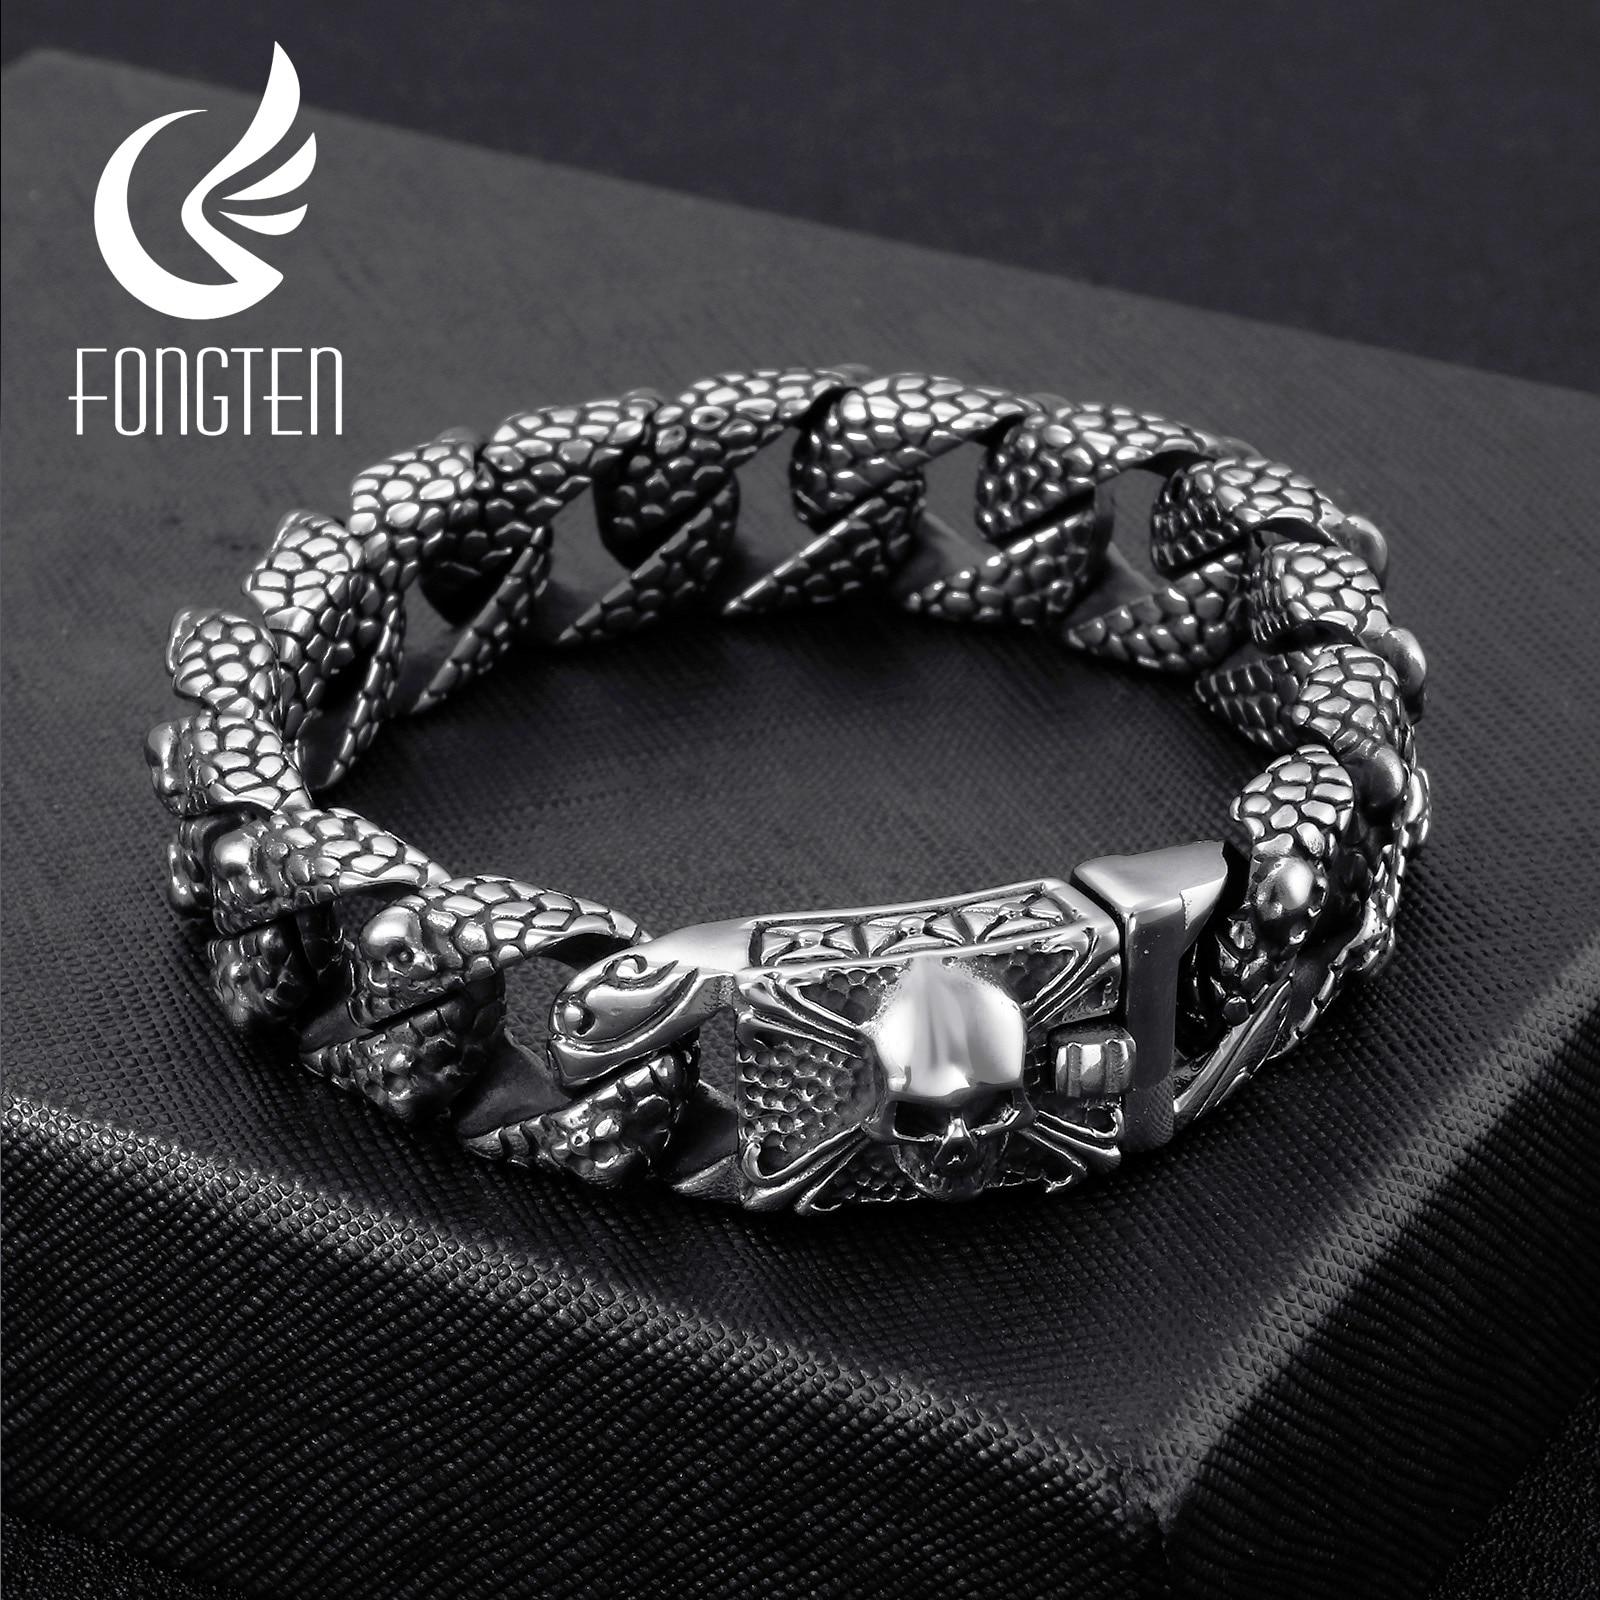 Fongten Gothic Retro Style Mens Bracelets Stainless Steel Skull Franco Link Curb Chain Bracelet For Men Punk Fashion Jewelry